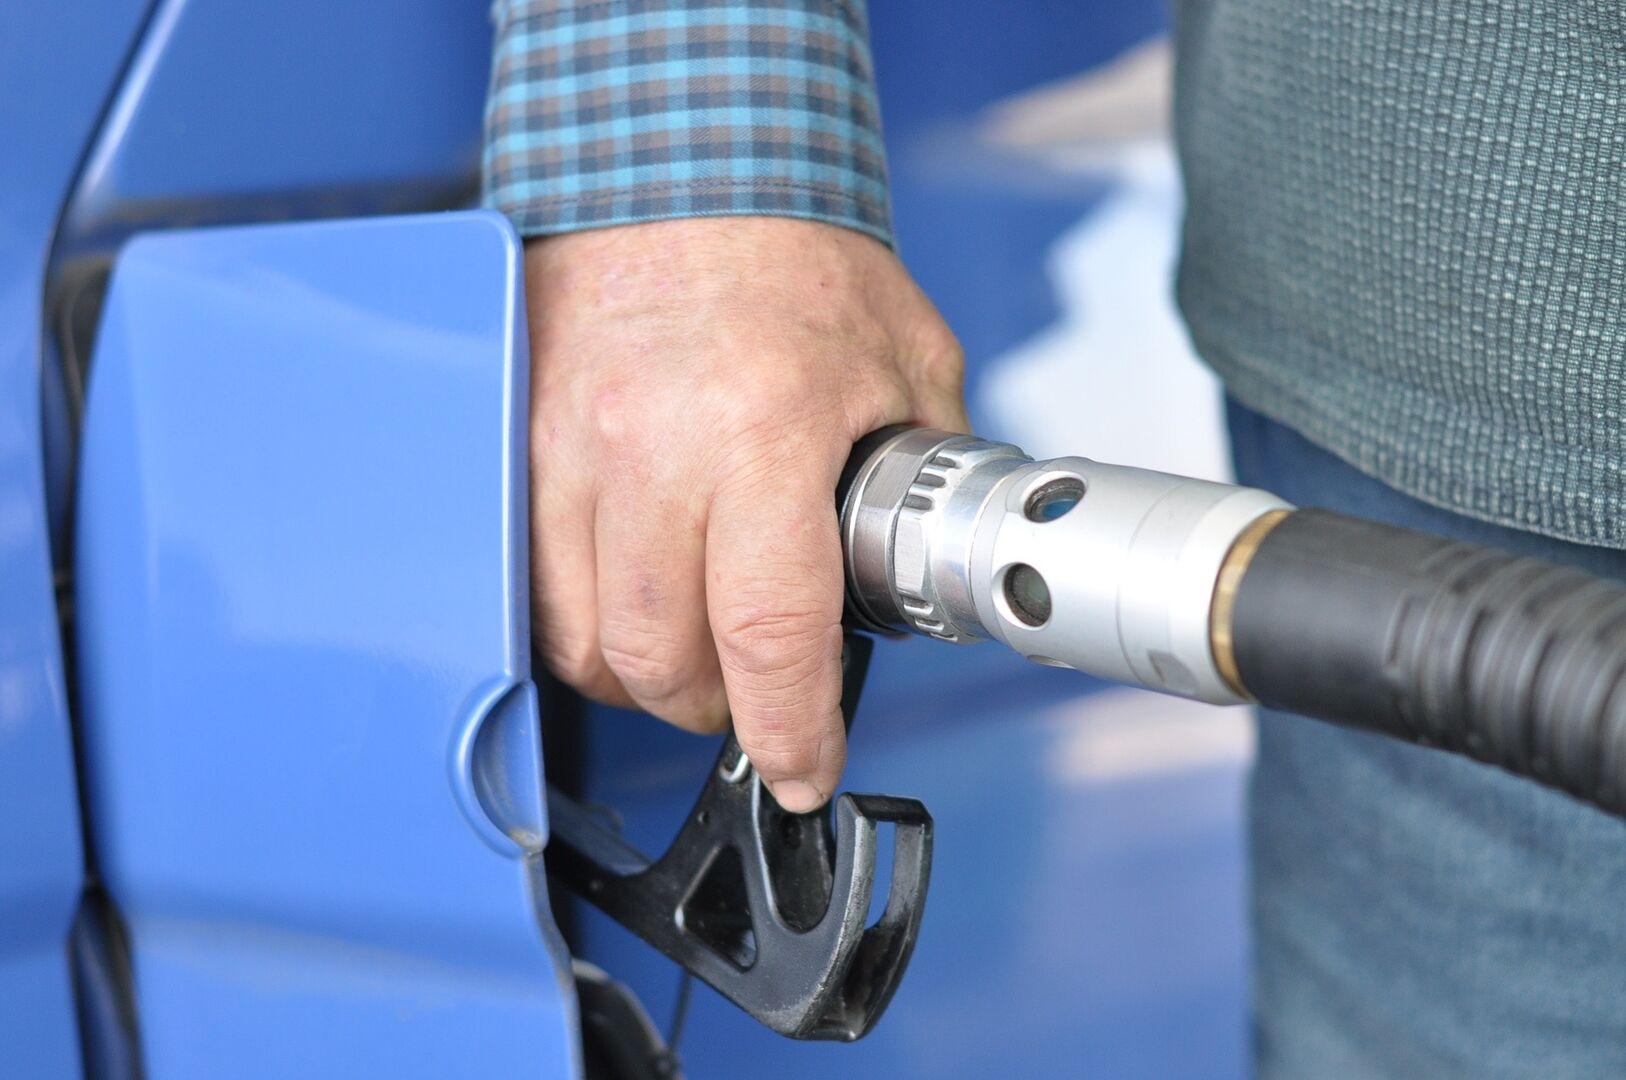 d639a5ca2708 El diésel en EEUU o China ya cuesta la mitad que en Europa - Libre ...